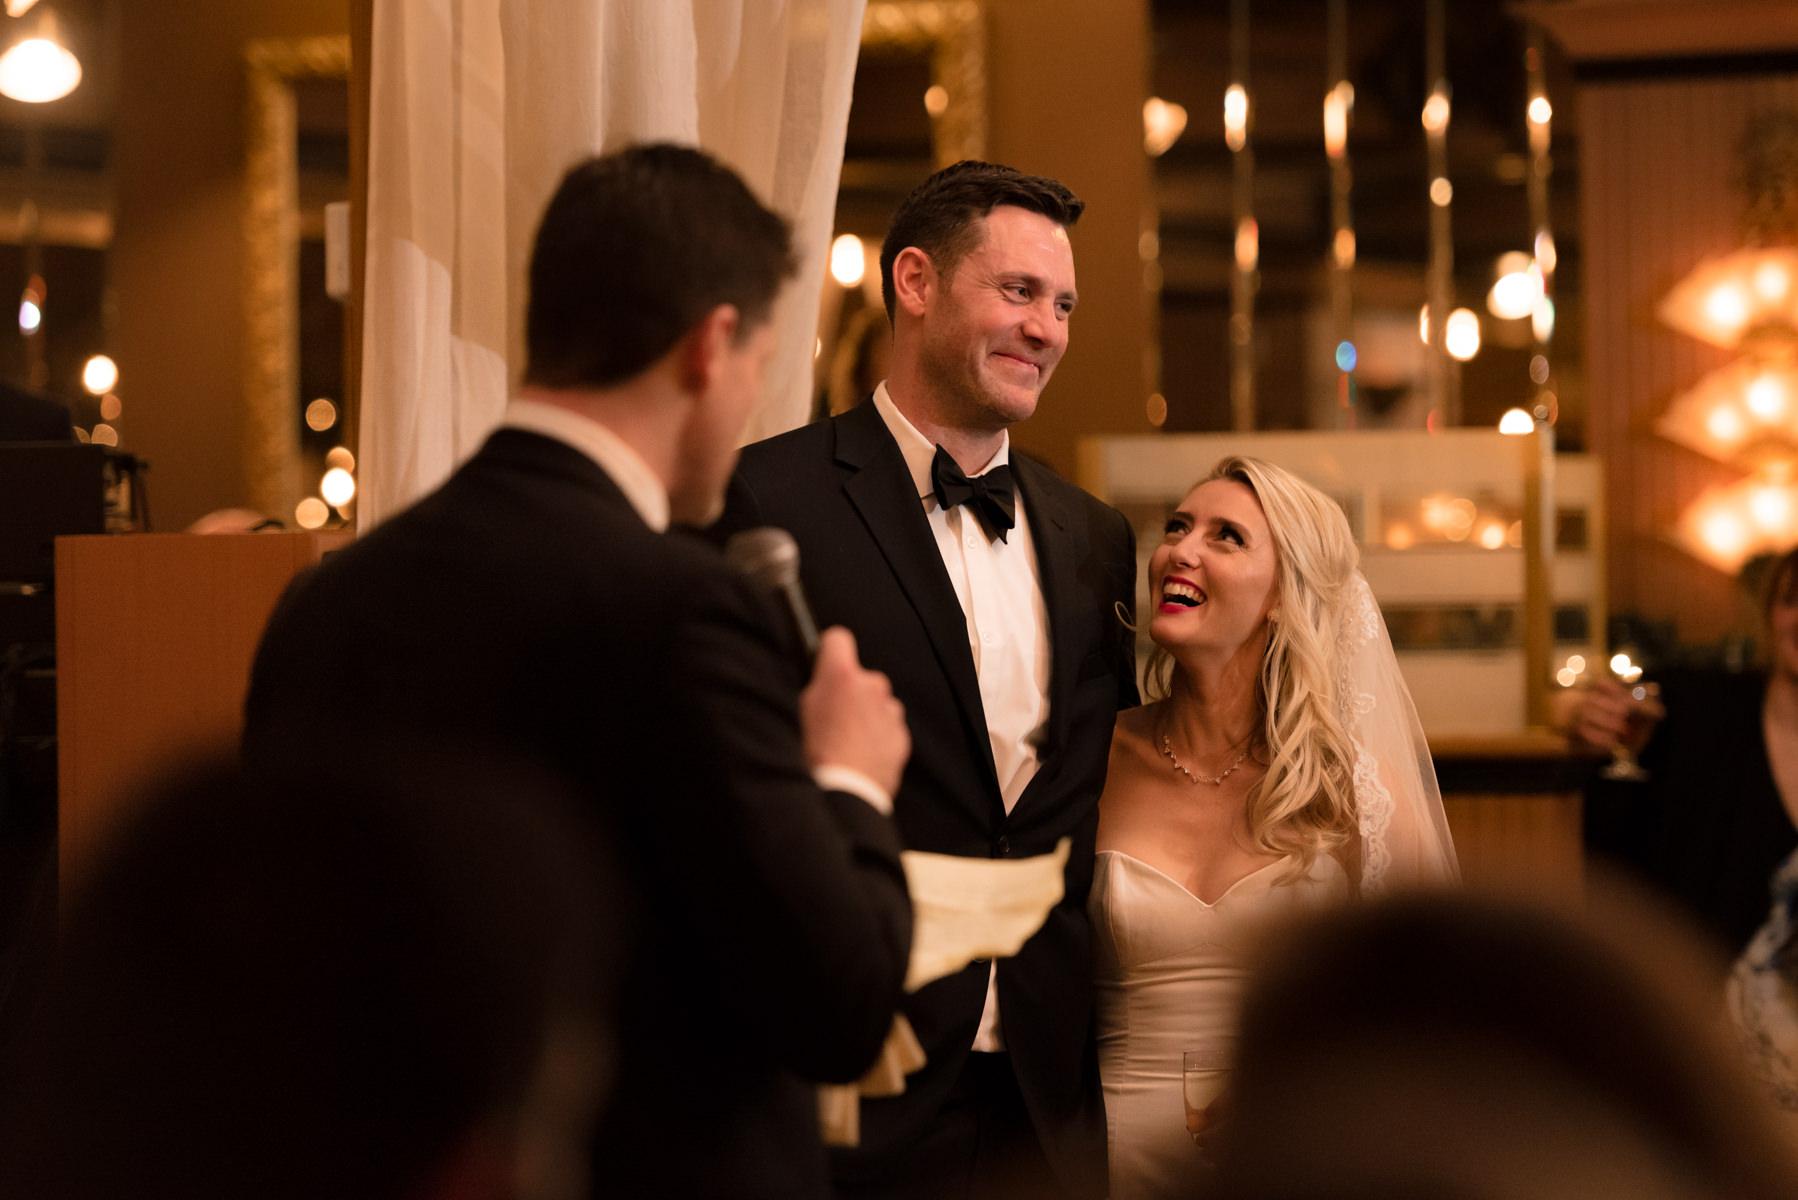 Andrew Tat - Documentary Wedding Photography - Lake Union Cafe - Seattle, Washington -Rachel and Ryan - 43.jpg